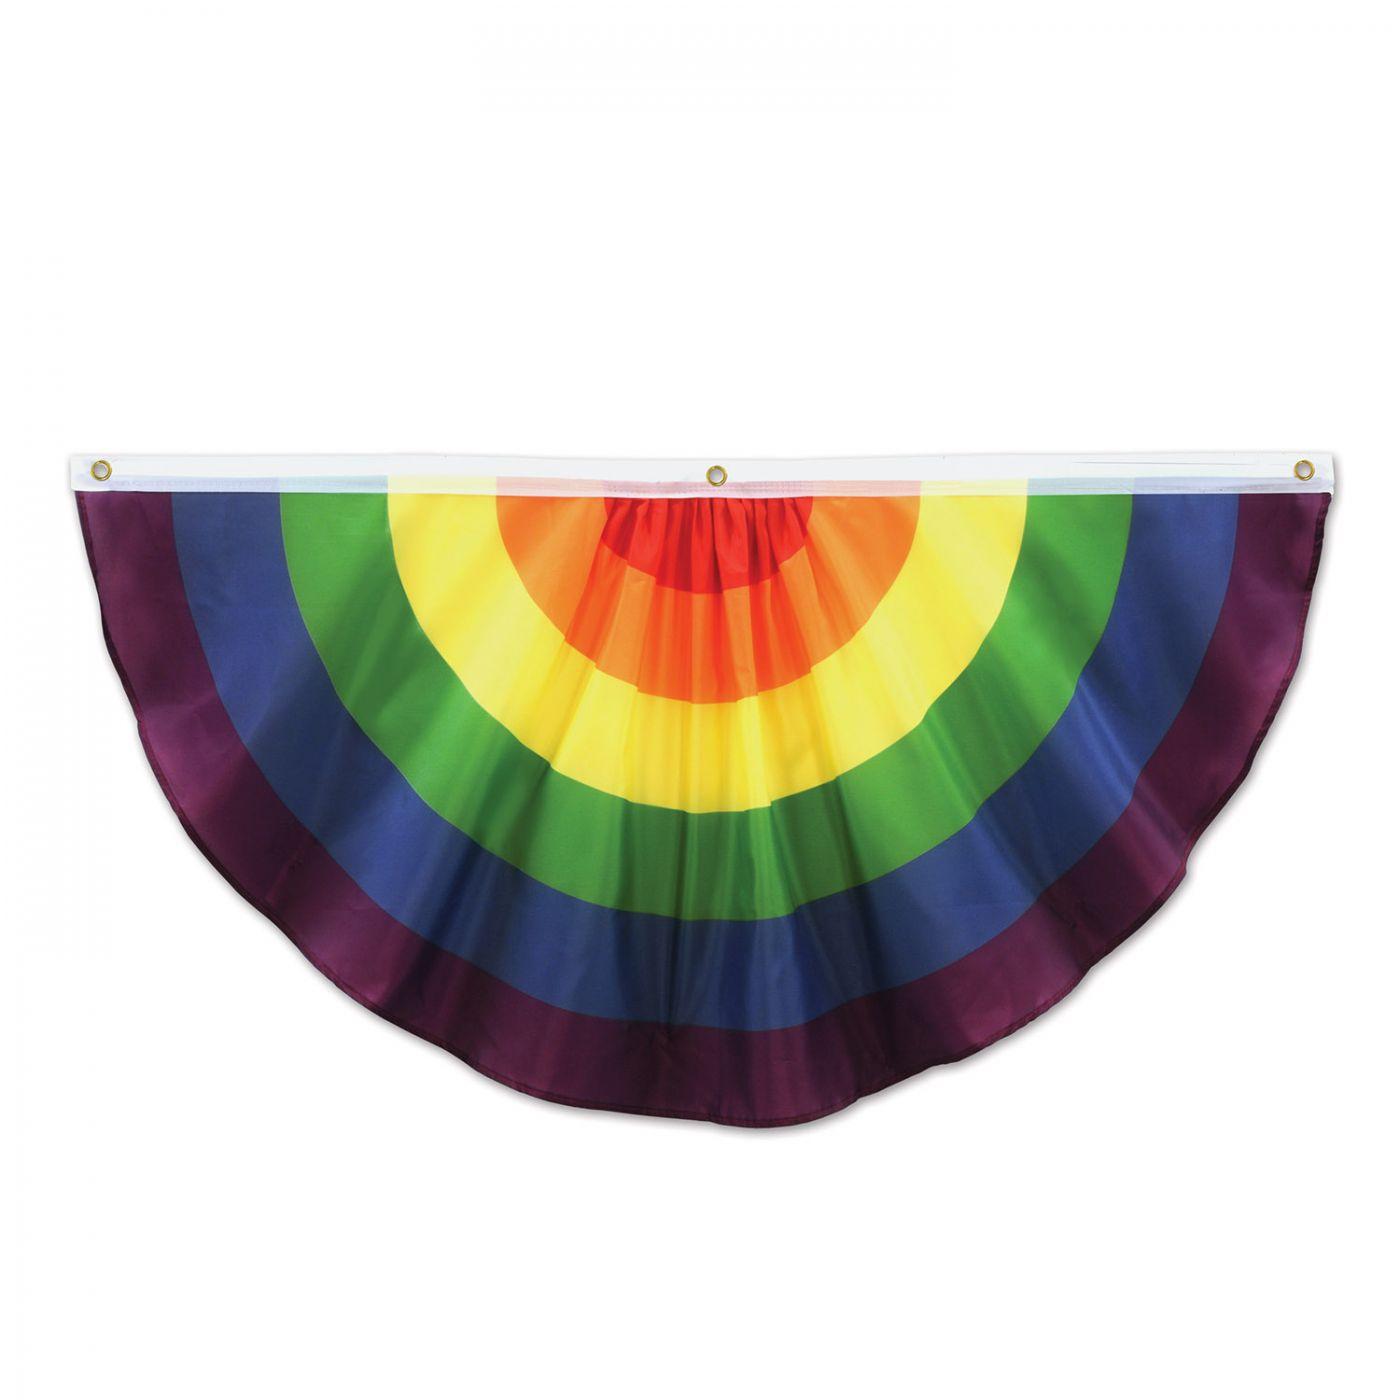 Rainbow Fabric Bunting (6) image